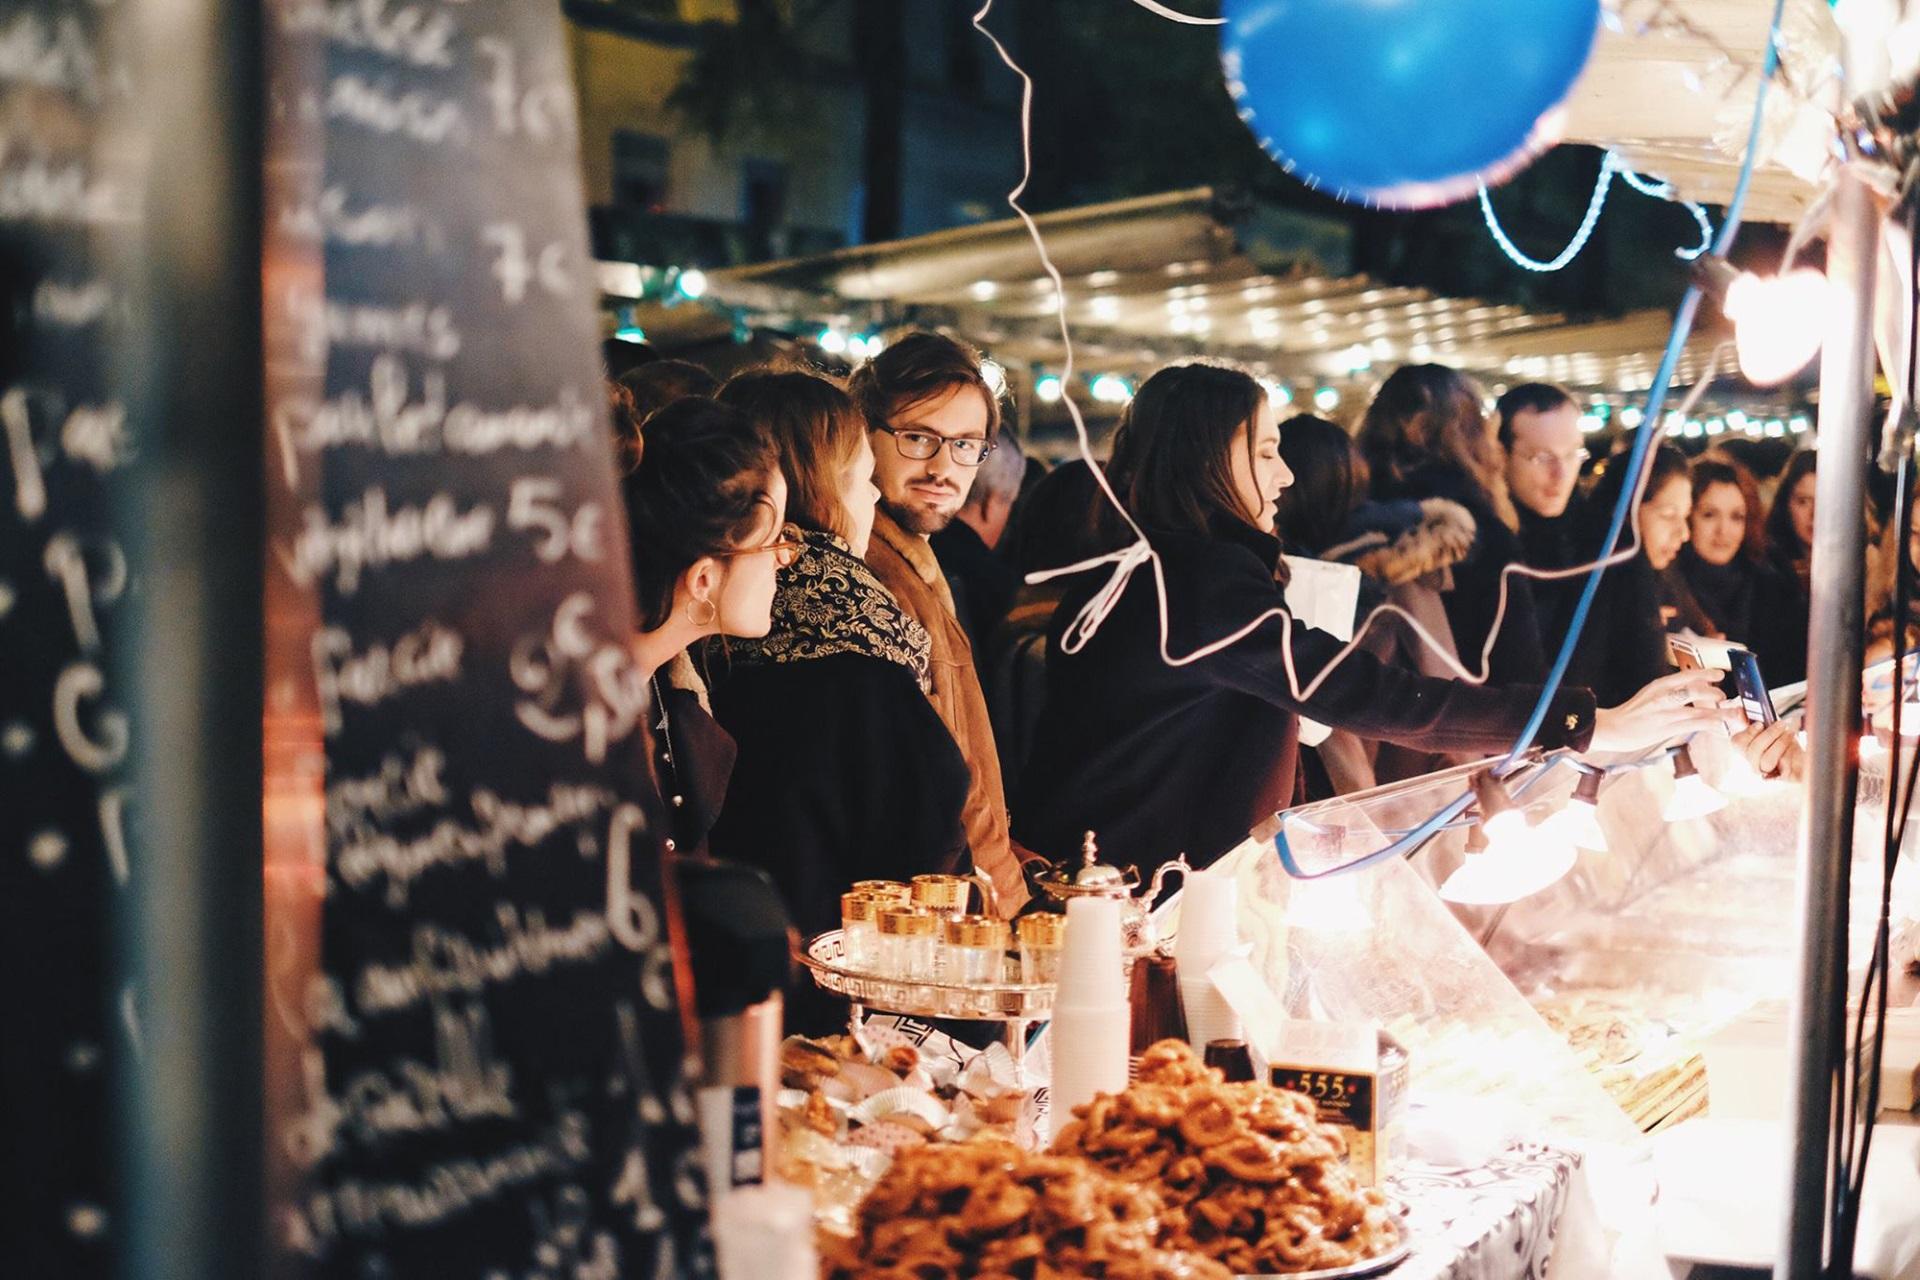 I migliori mercati di Parigi